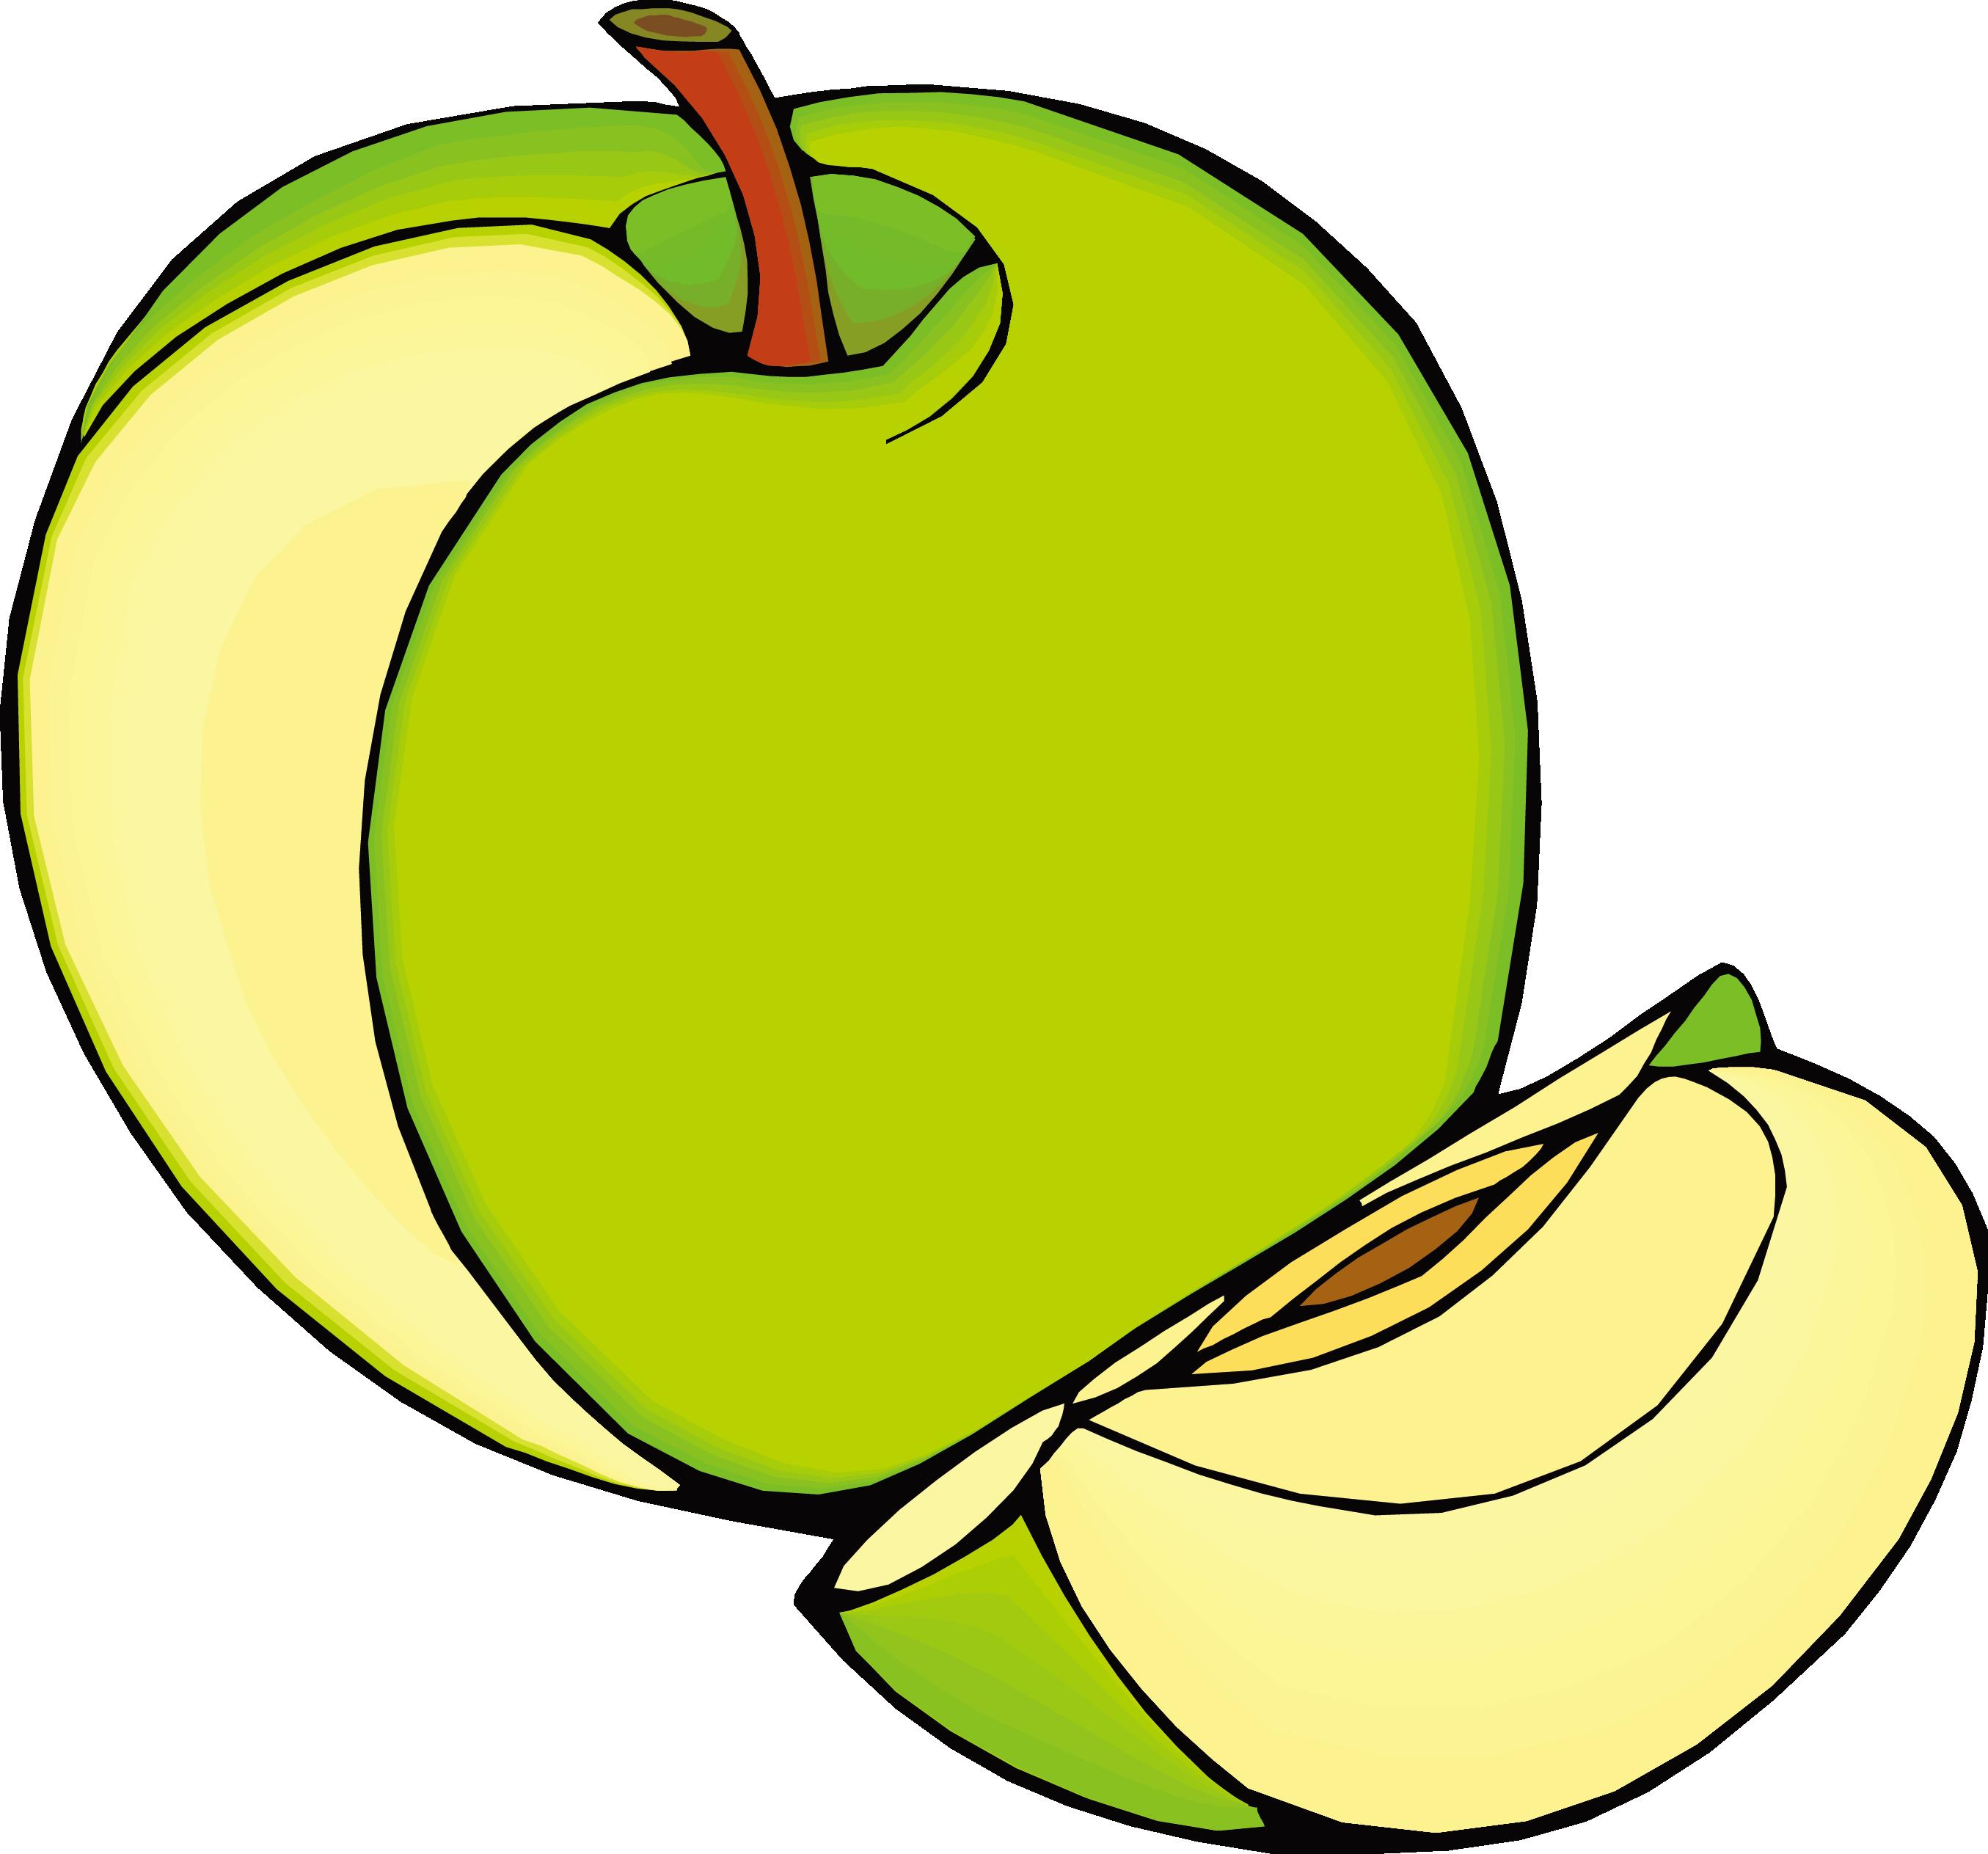 Et lxe gumes vegetable. Fruits clipart green fruit